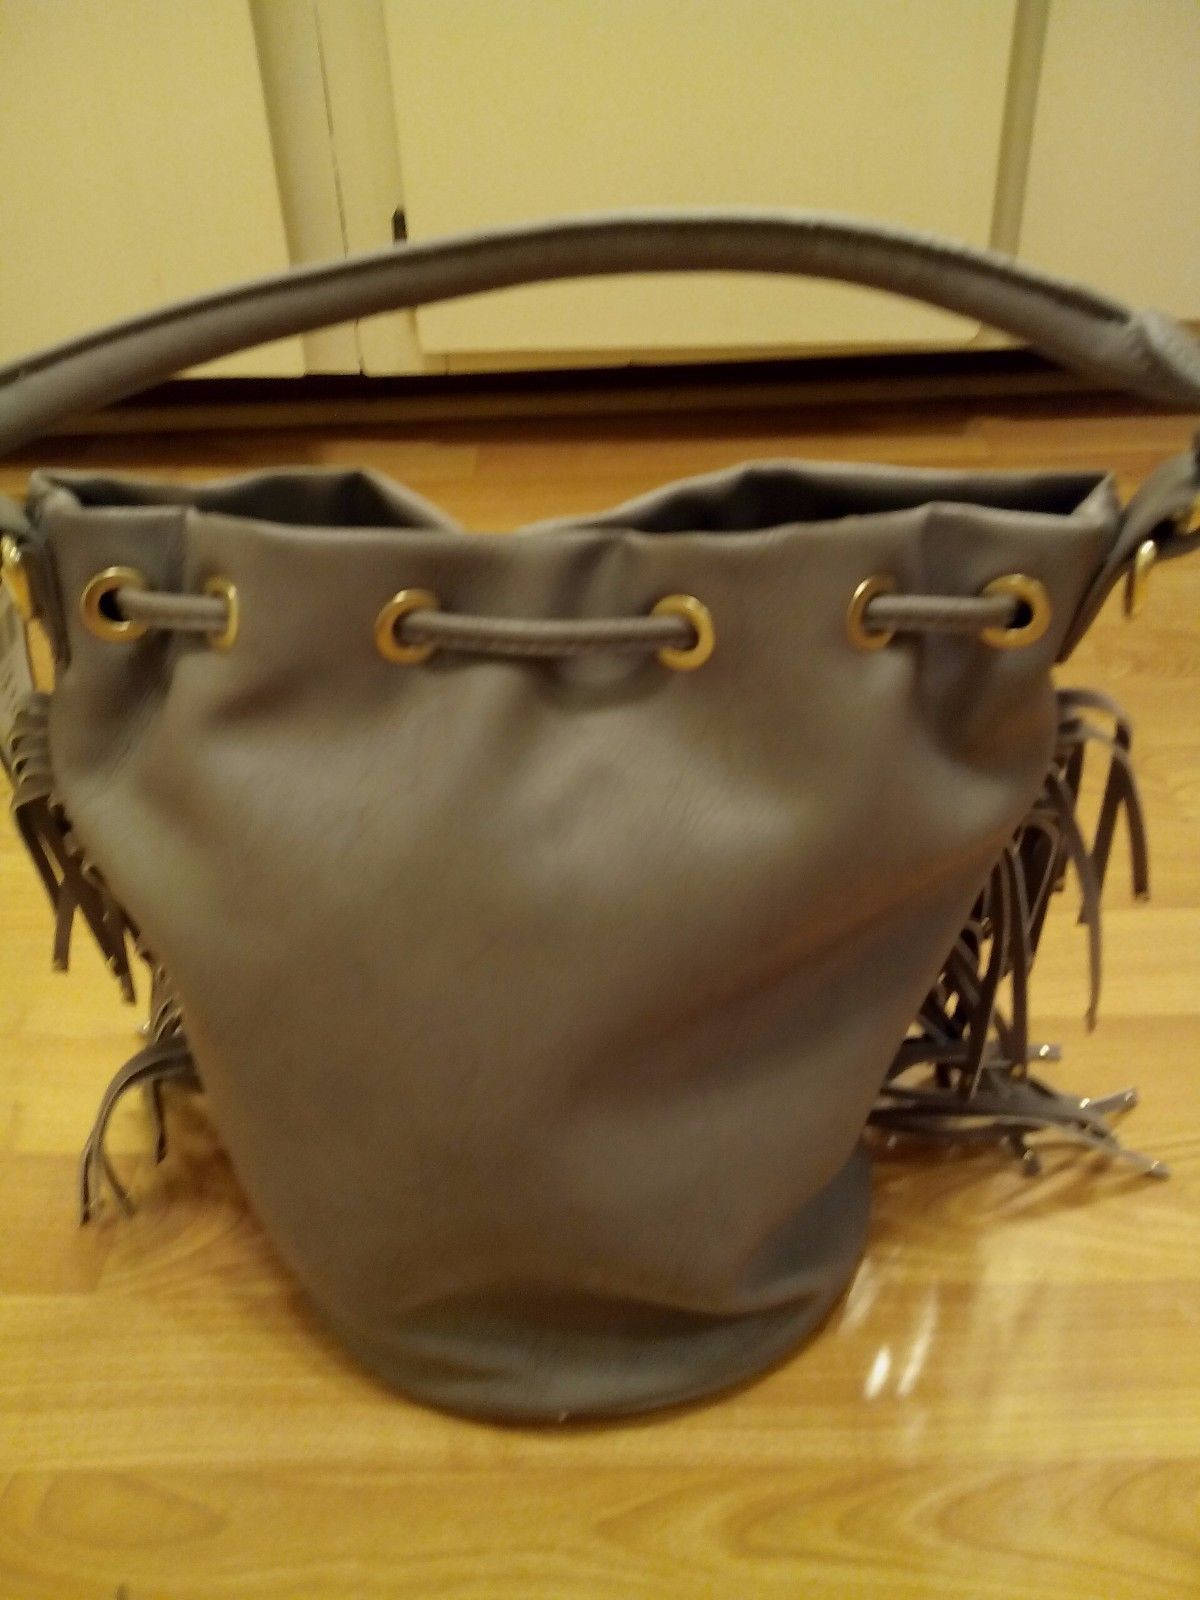 6ae2c73ab3 New BCBG Taupe Faux Leather Fringe Tote Shoulder Bag DC14-BCBGP-0091